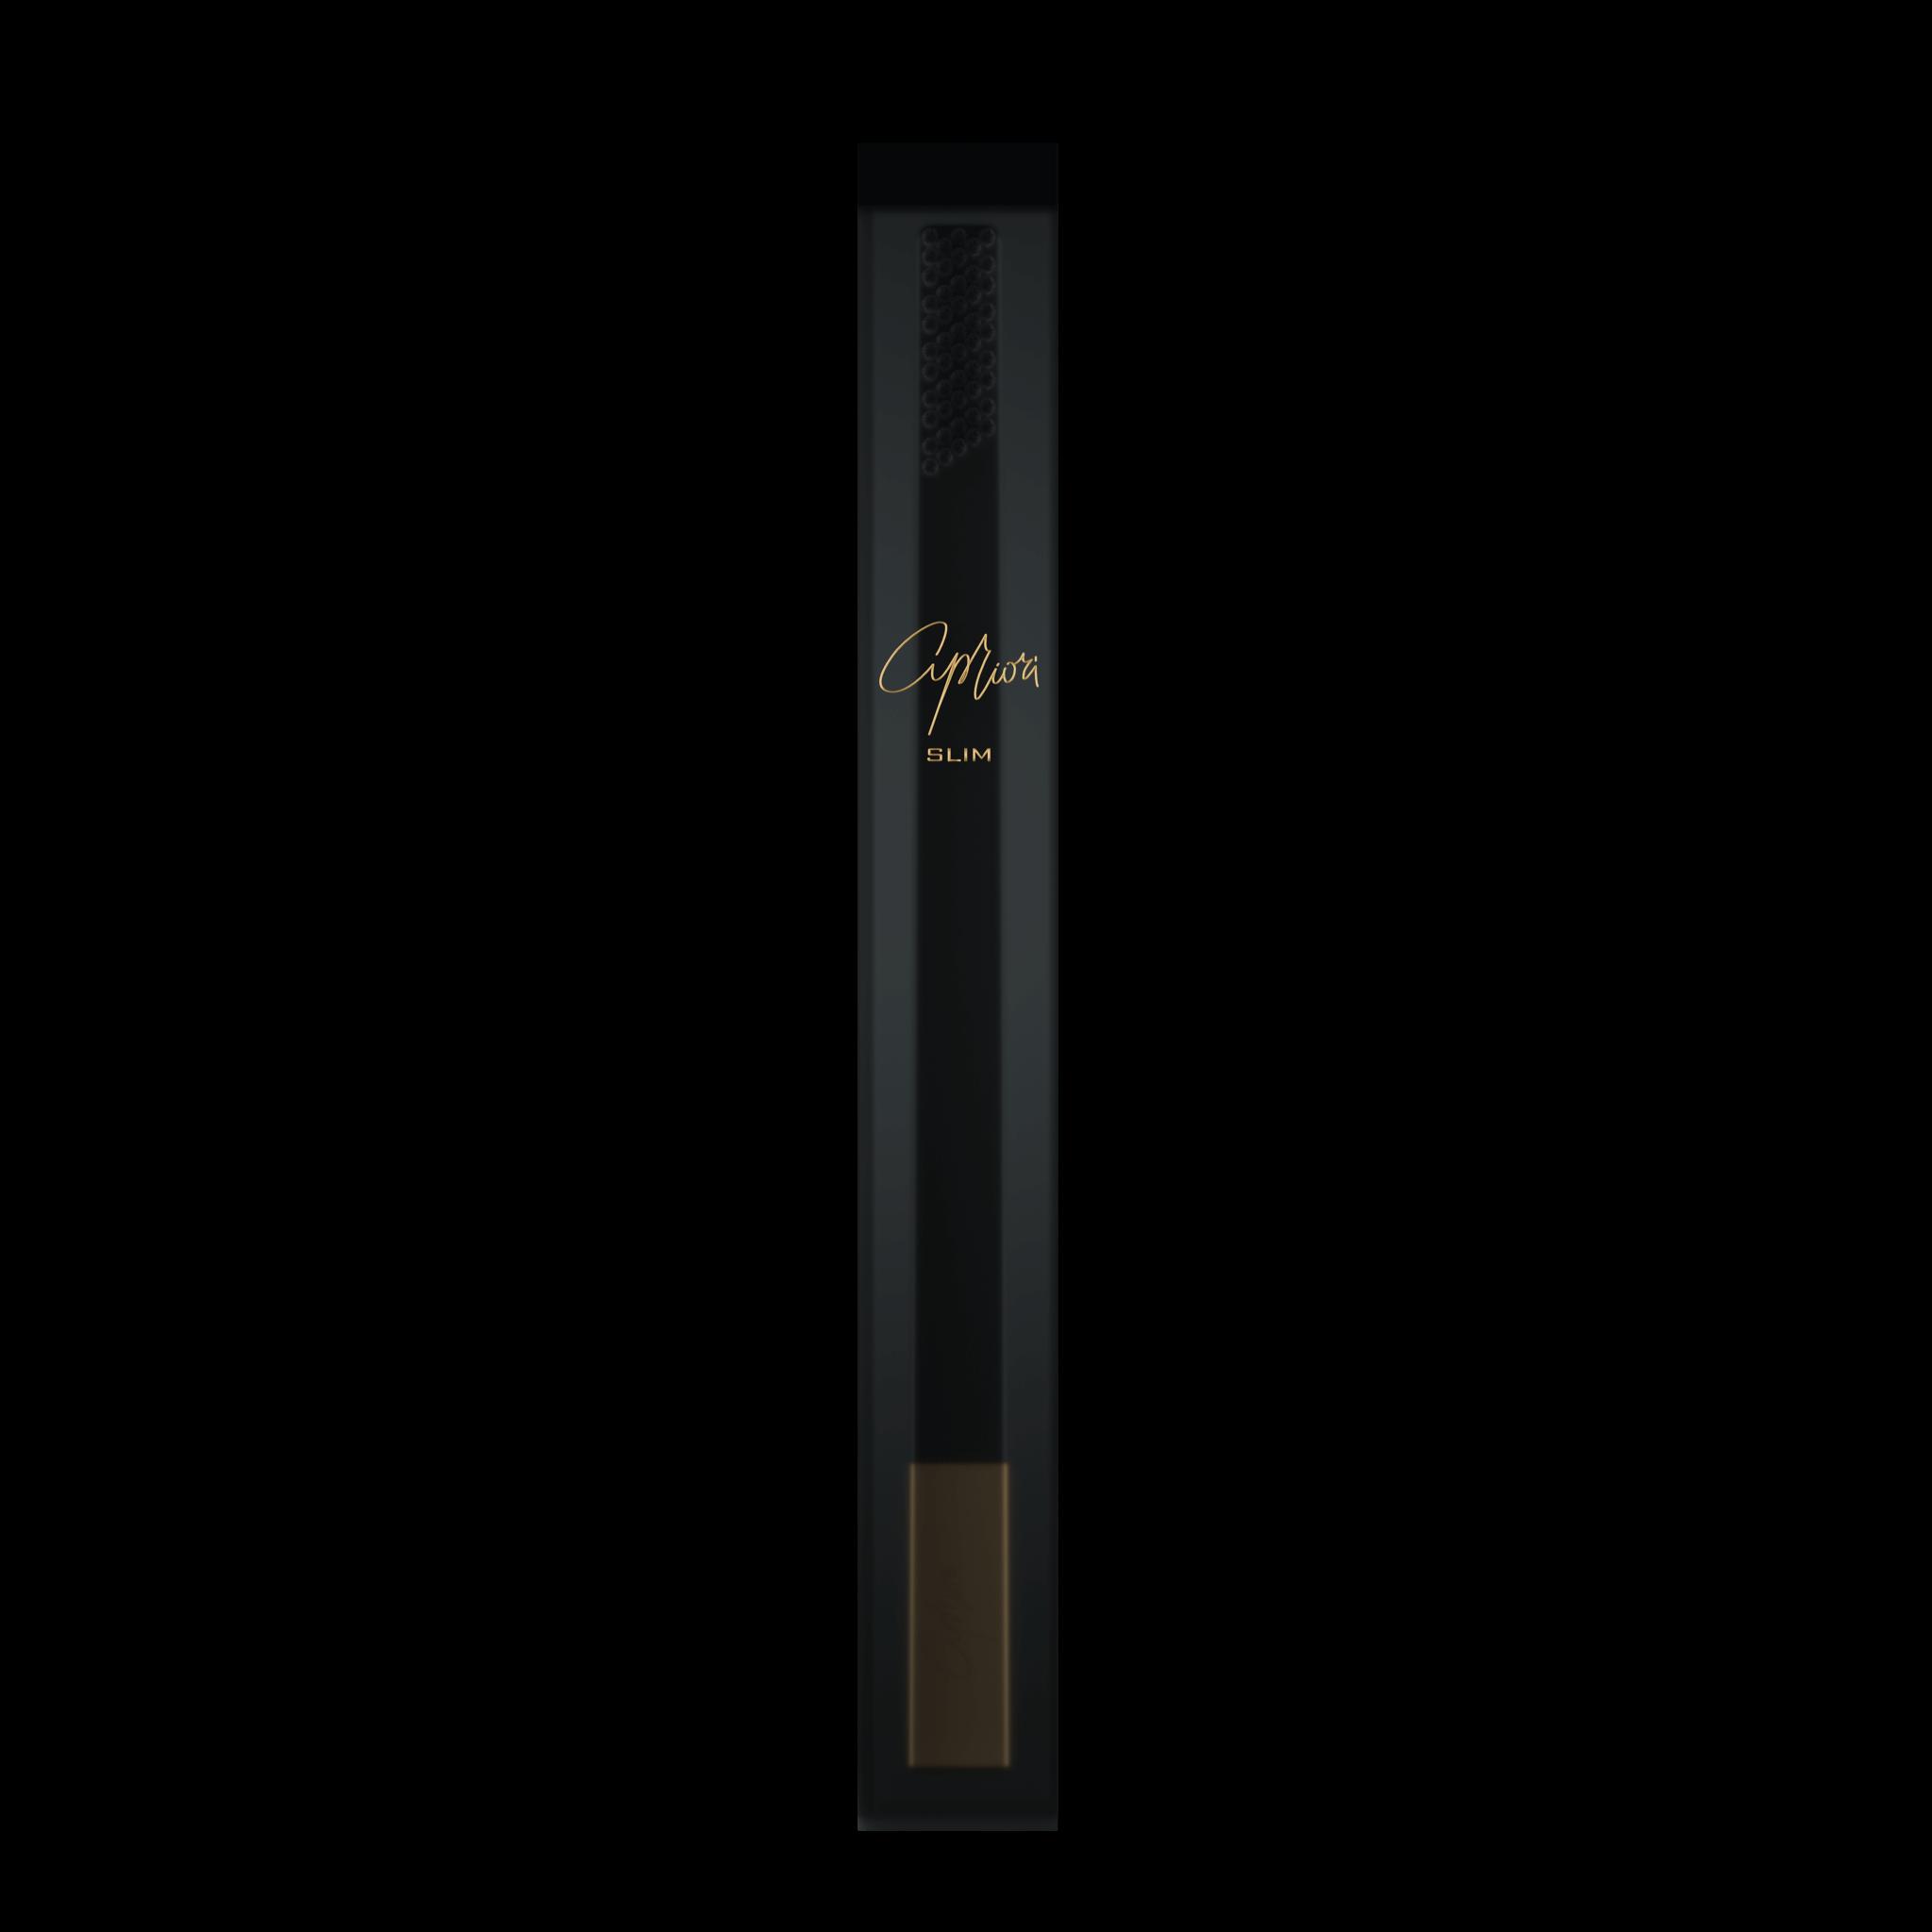 SLIM by Apriori black & gold designer toothbrush package